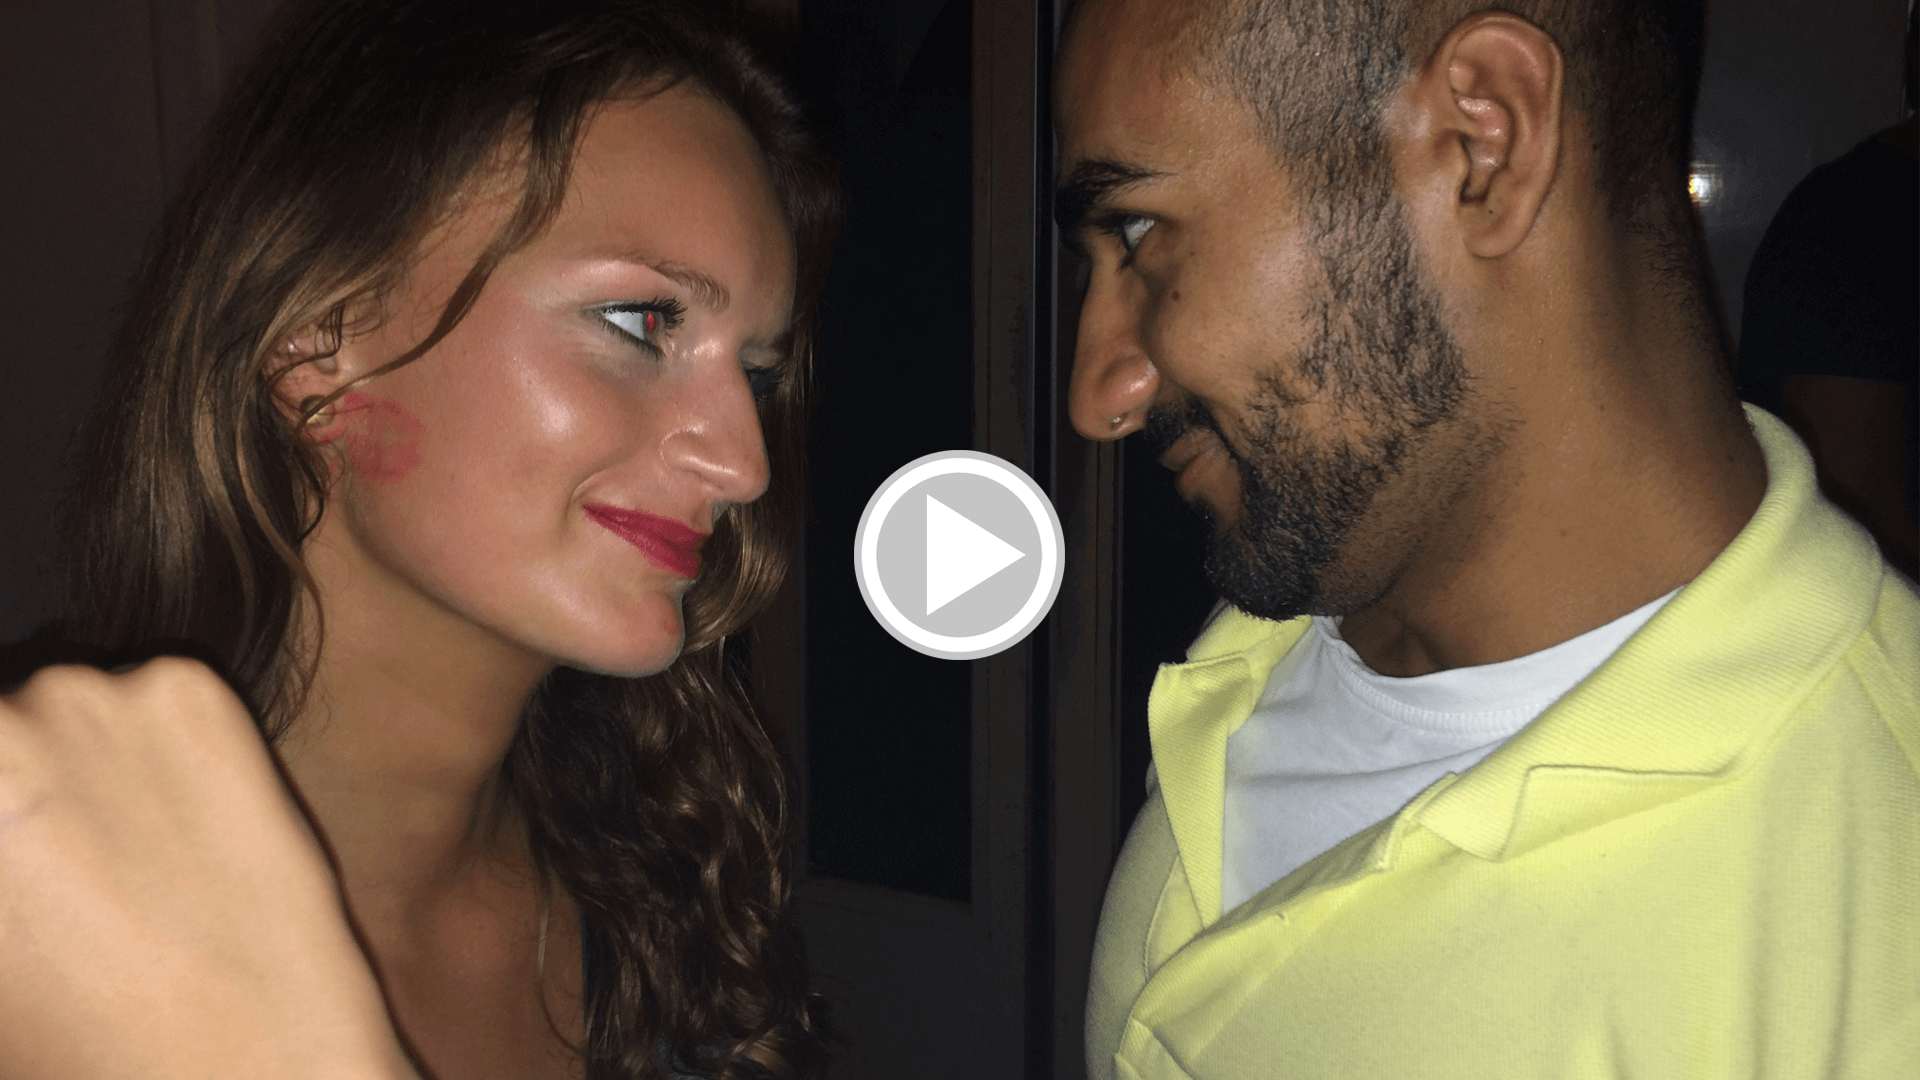 gratis dating plattform Bremerhaven